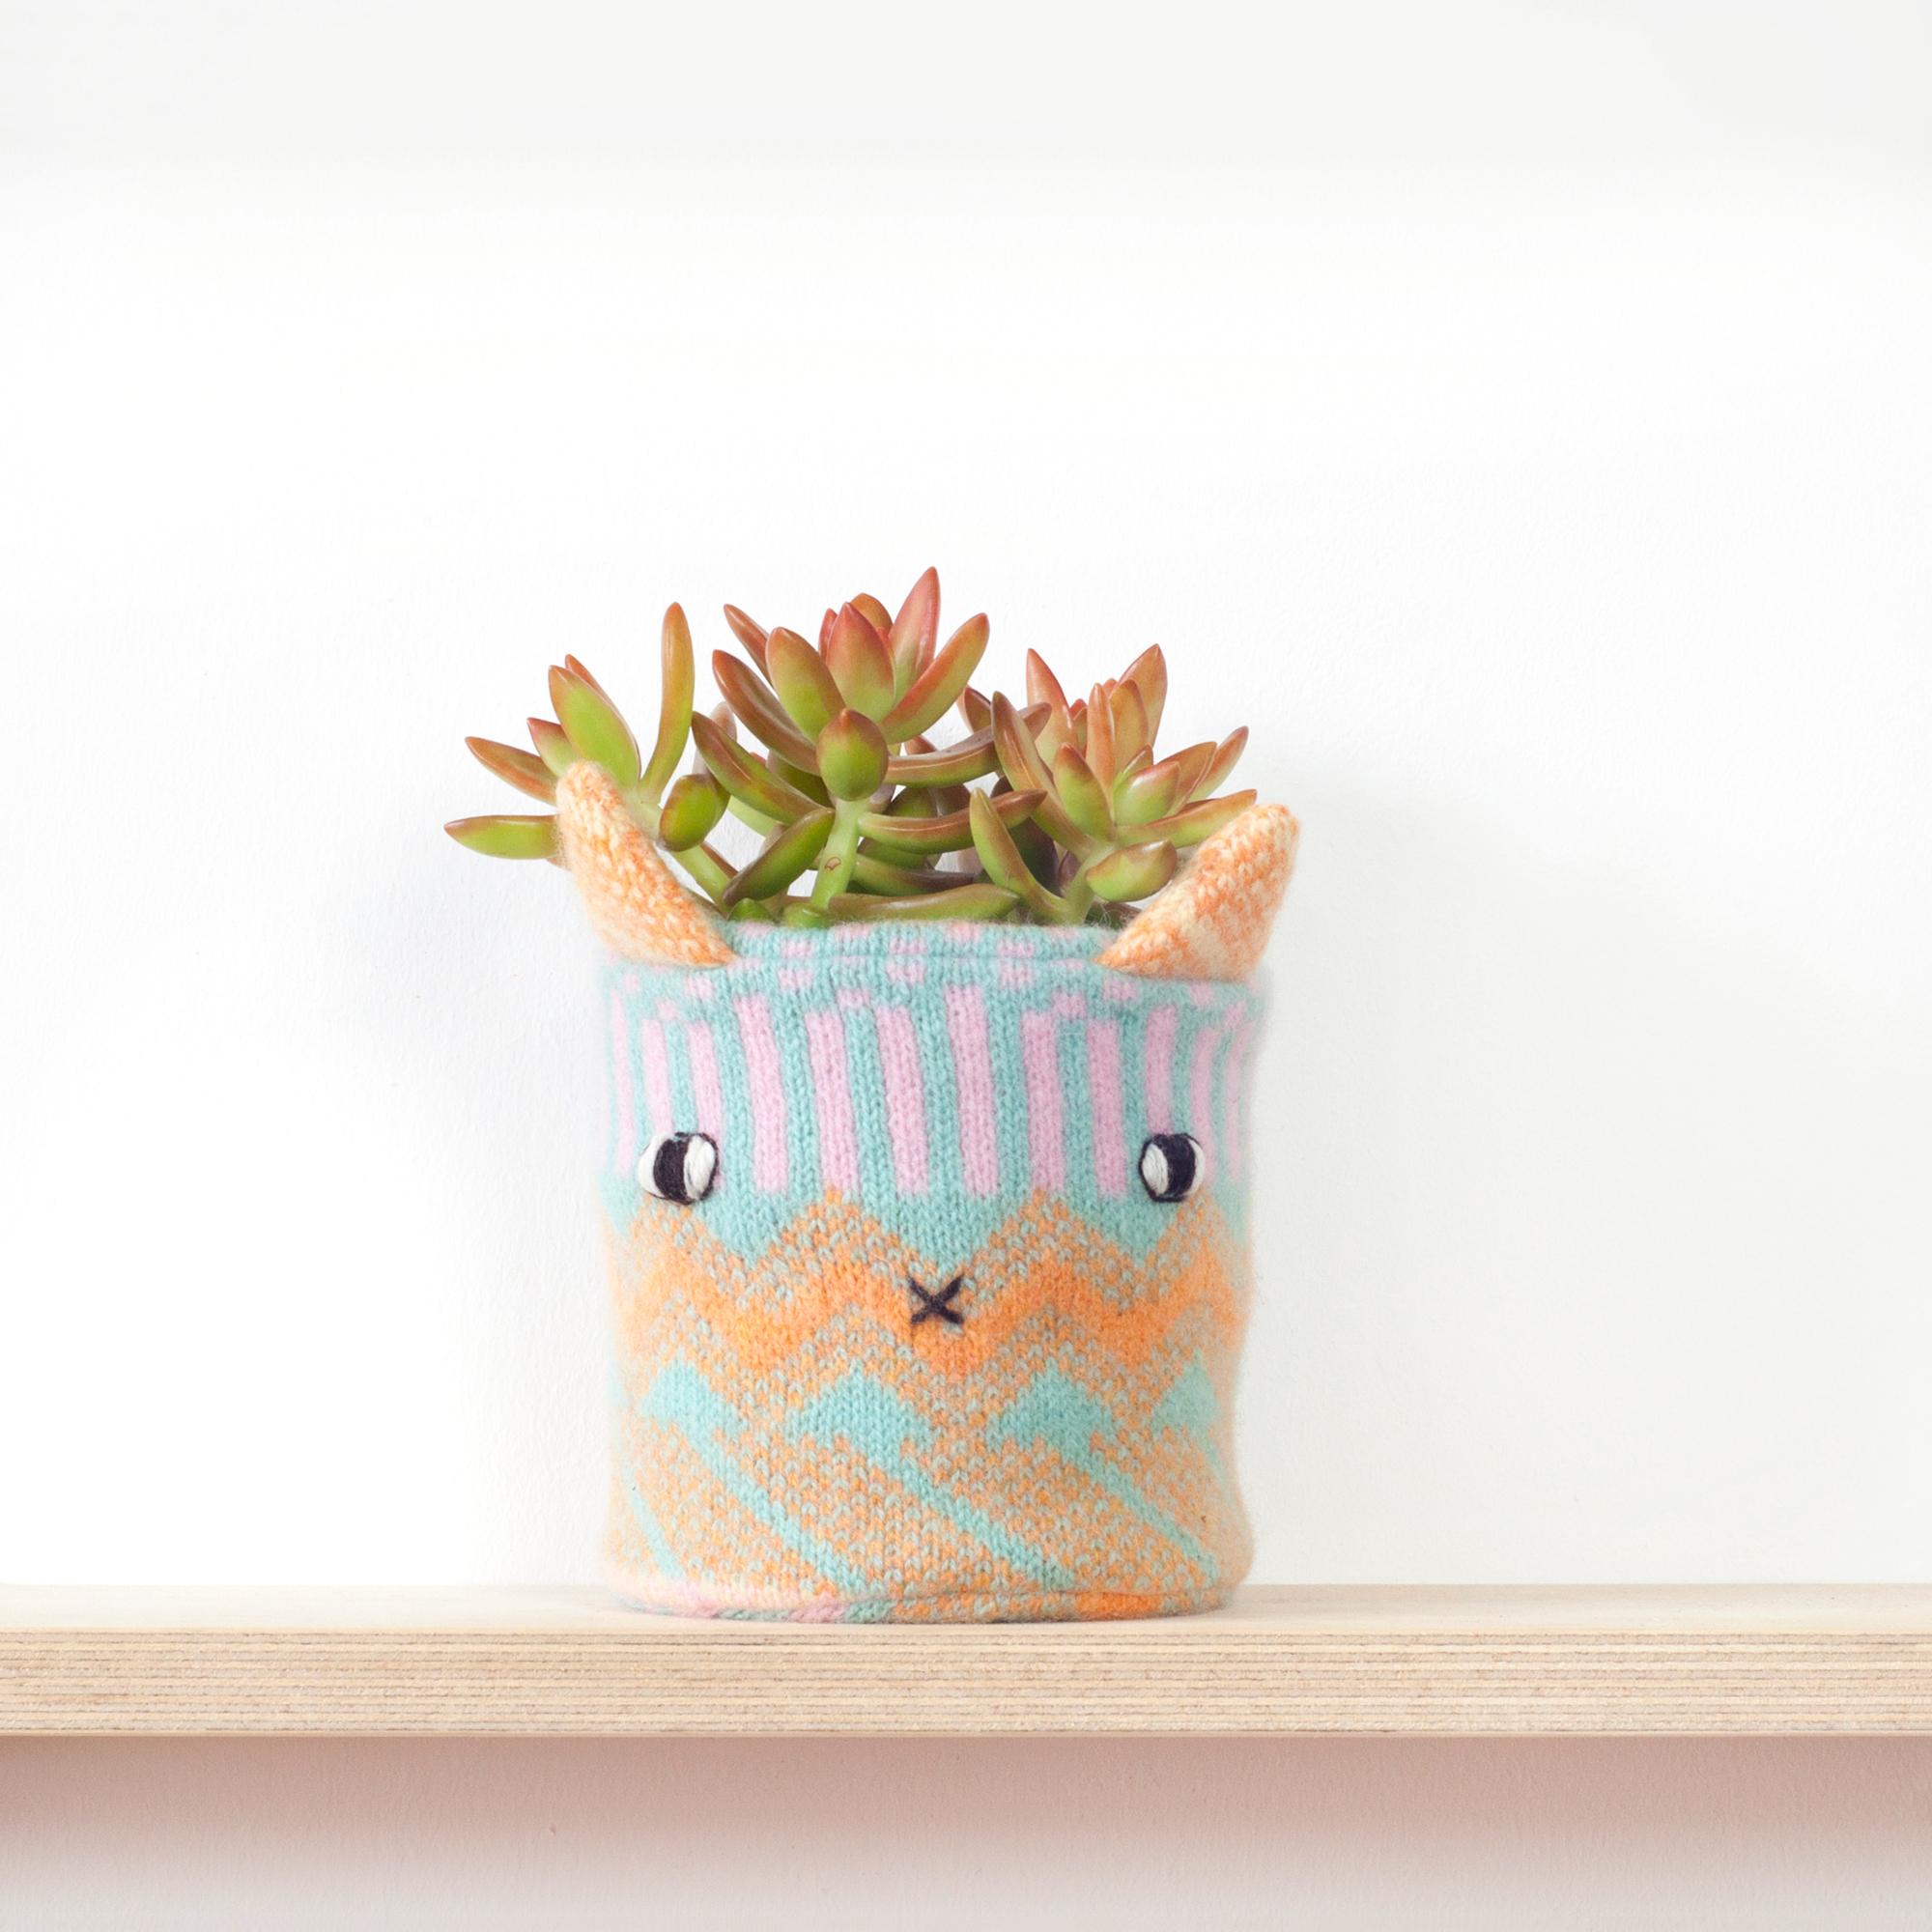 7-plantpot-donnawilson-web.jpg